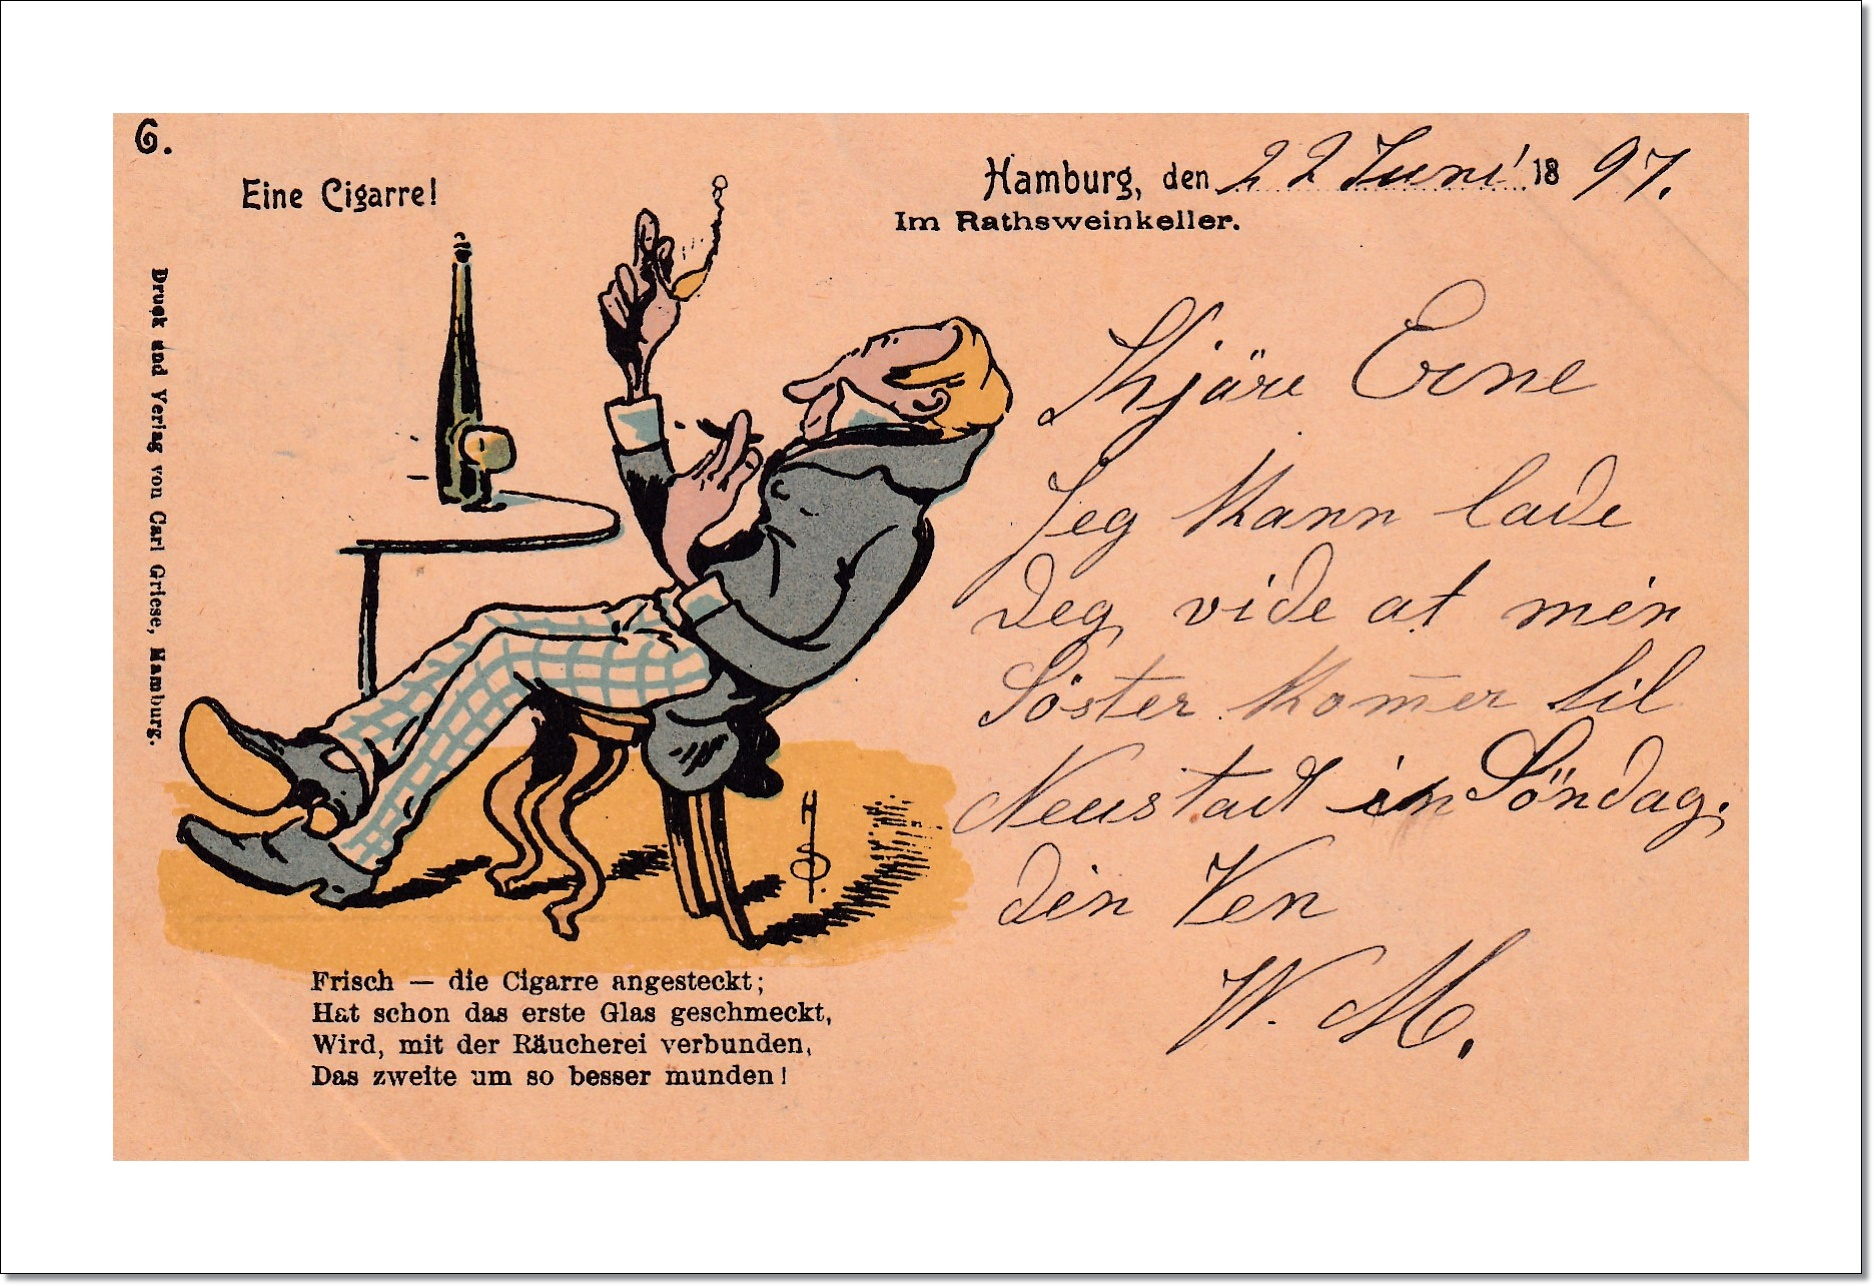 Eine Cigarre - 23.06.1897 - Un Un cigare - A cigar